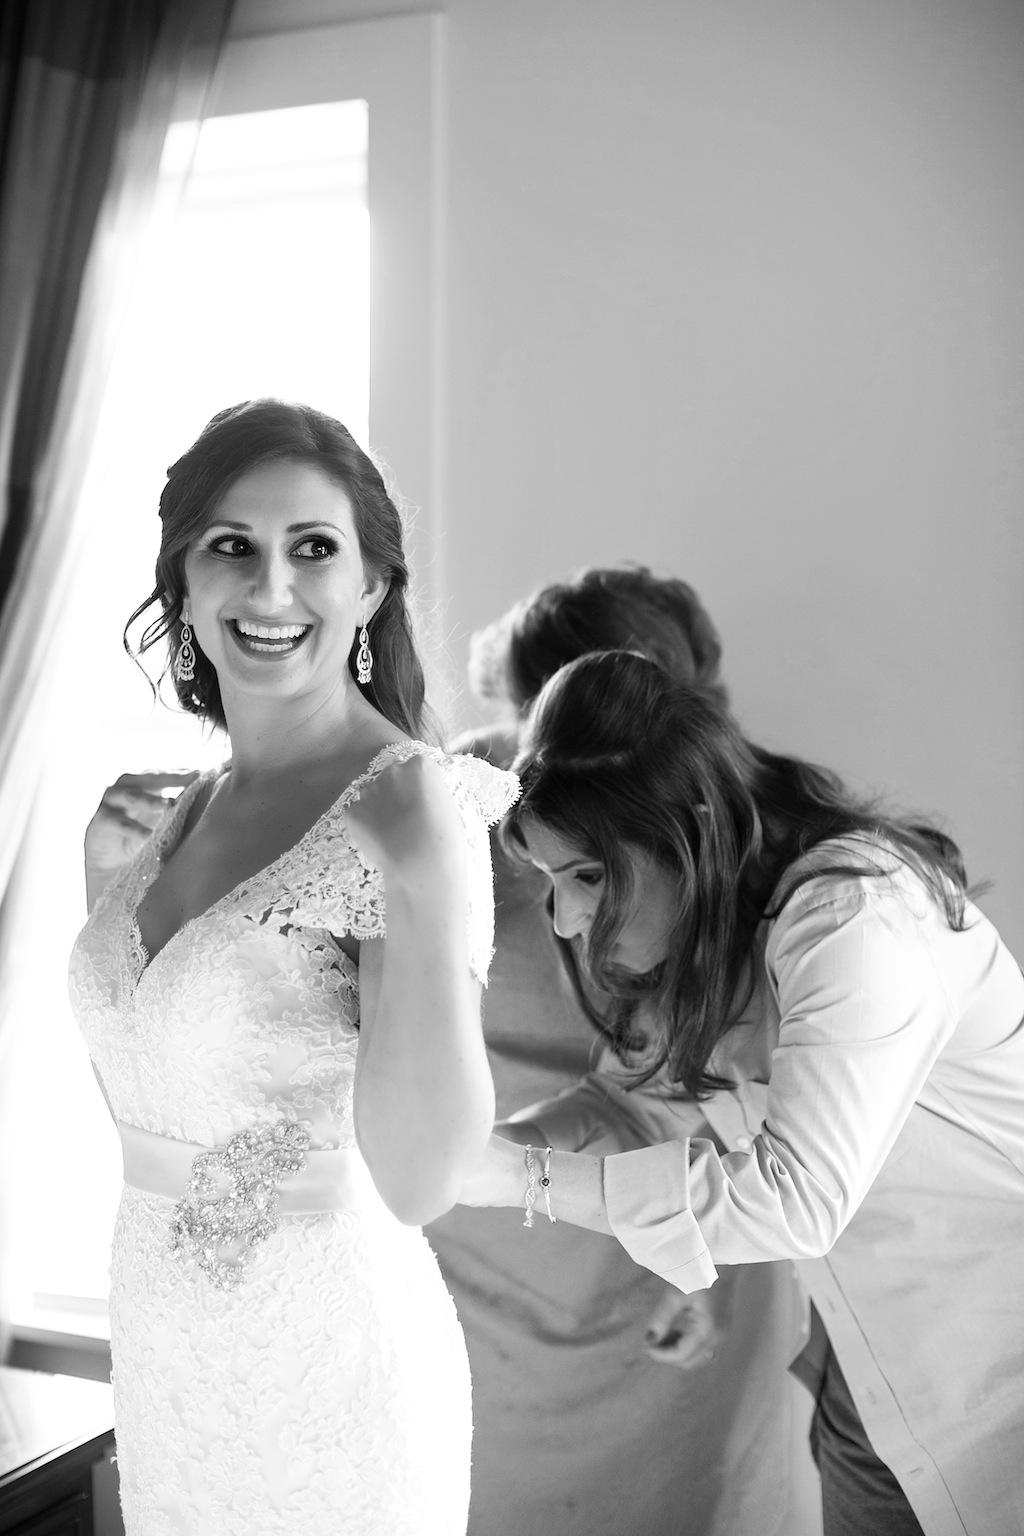 Downtown St. Pete Wedding - Birchwood Wedding - North Straub Park Wedding - Jenn Hopkins Photography (13)